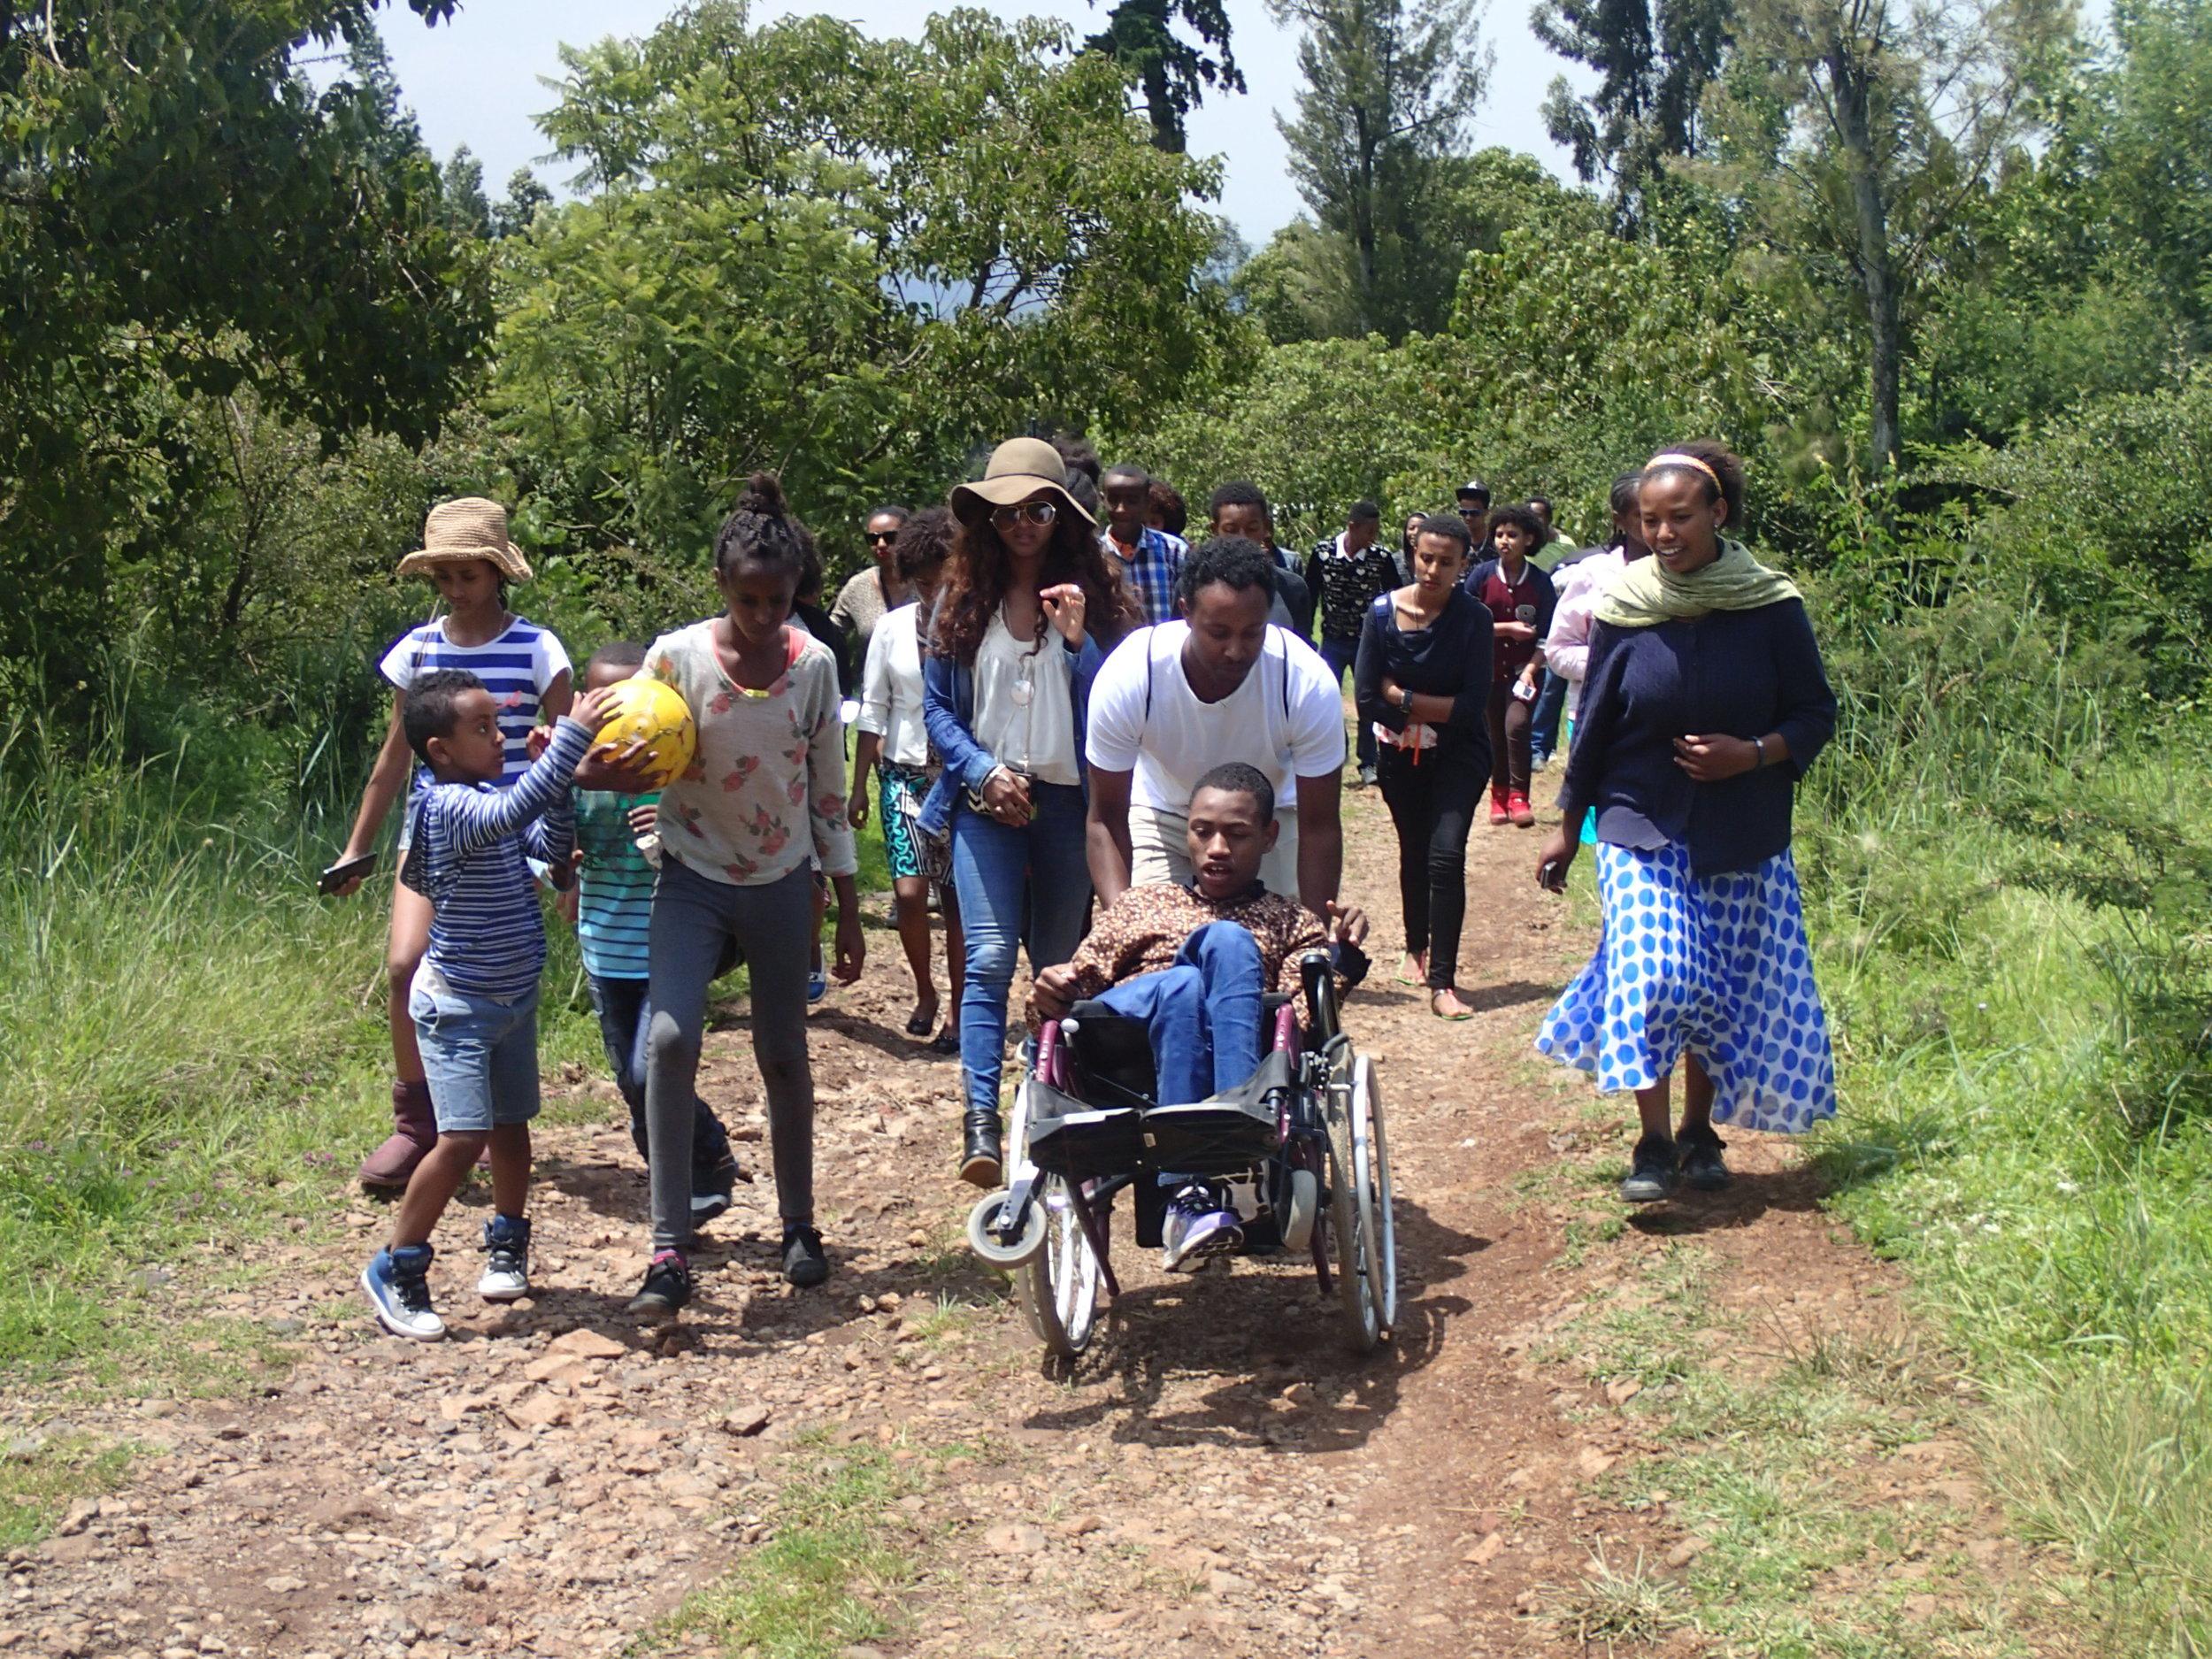 Brave Hearts' visit to Born Free wildlife preserve